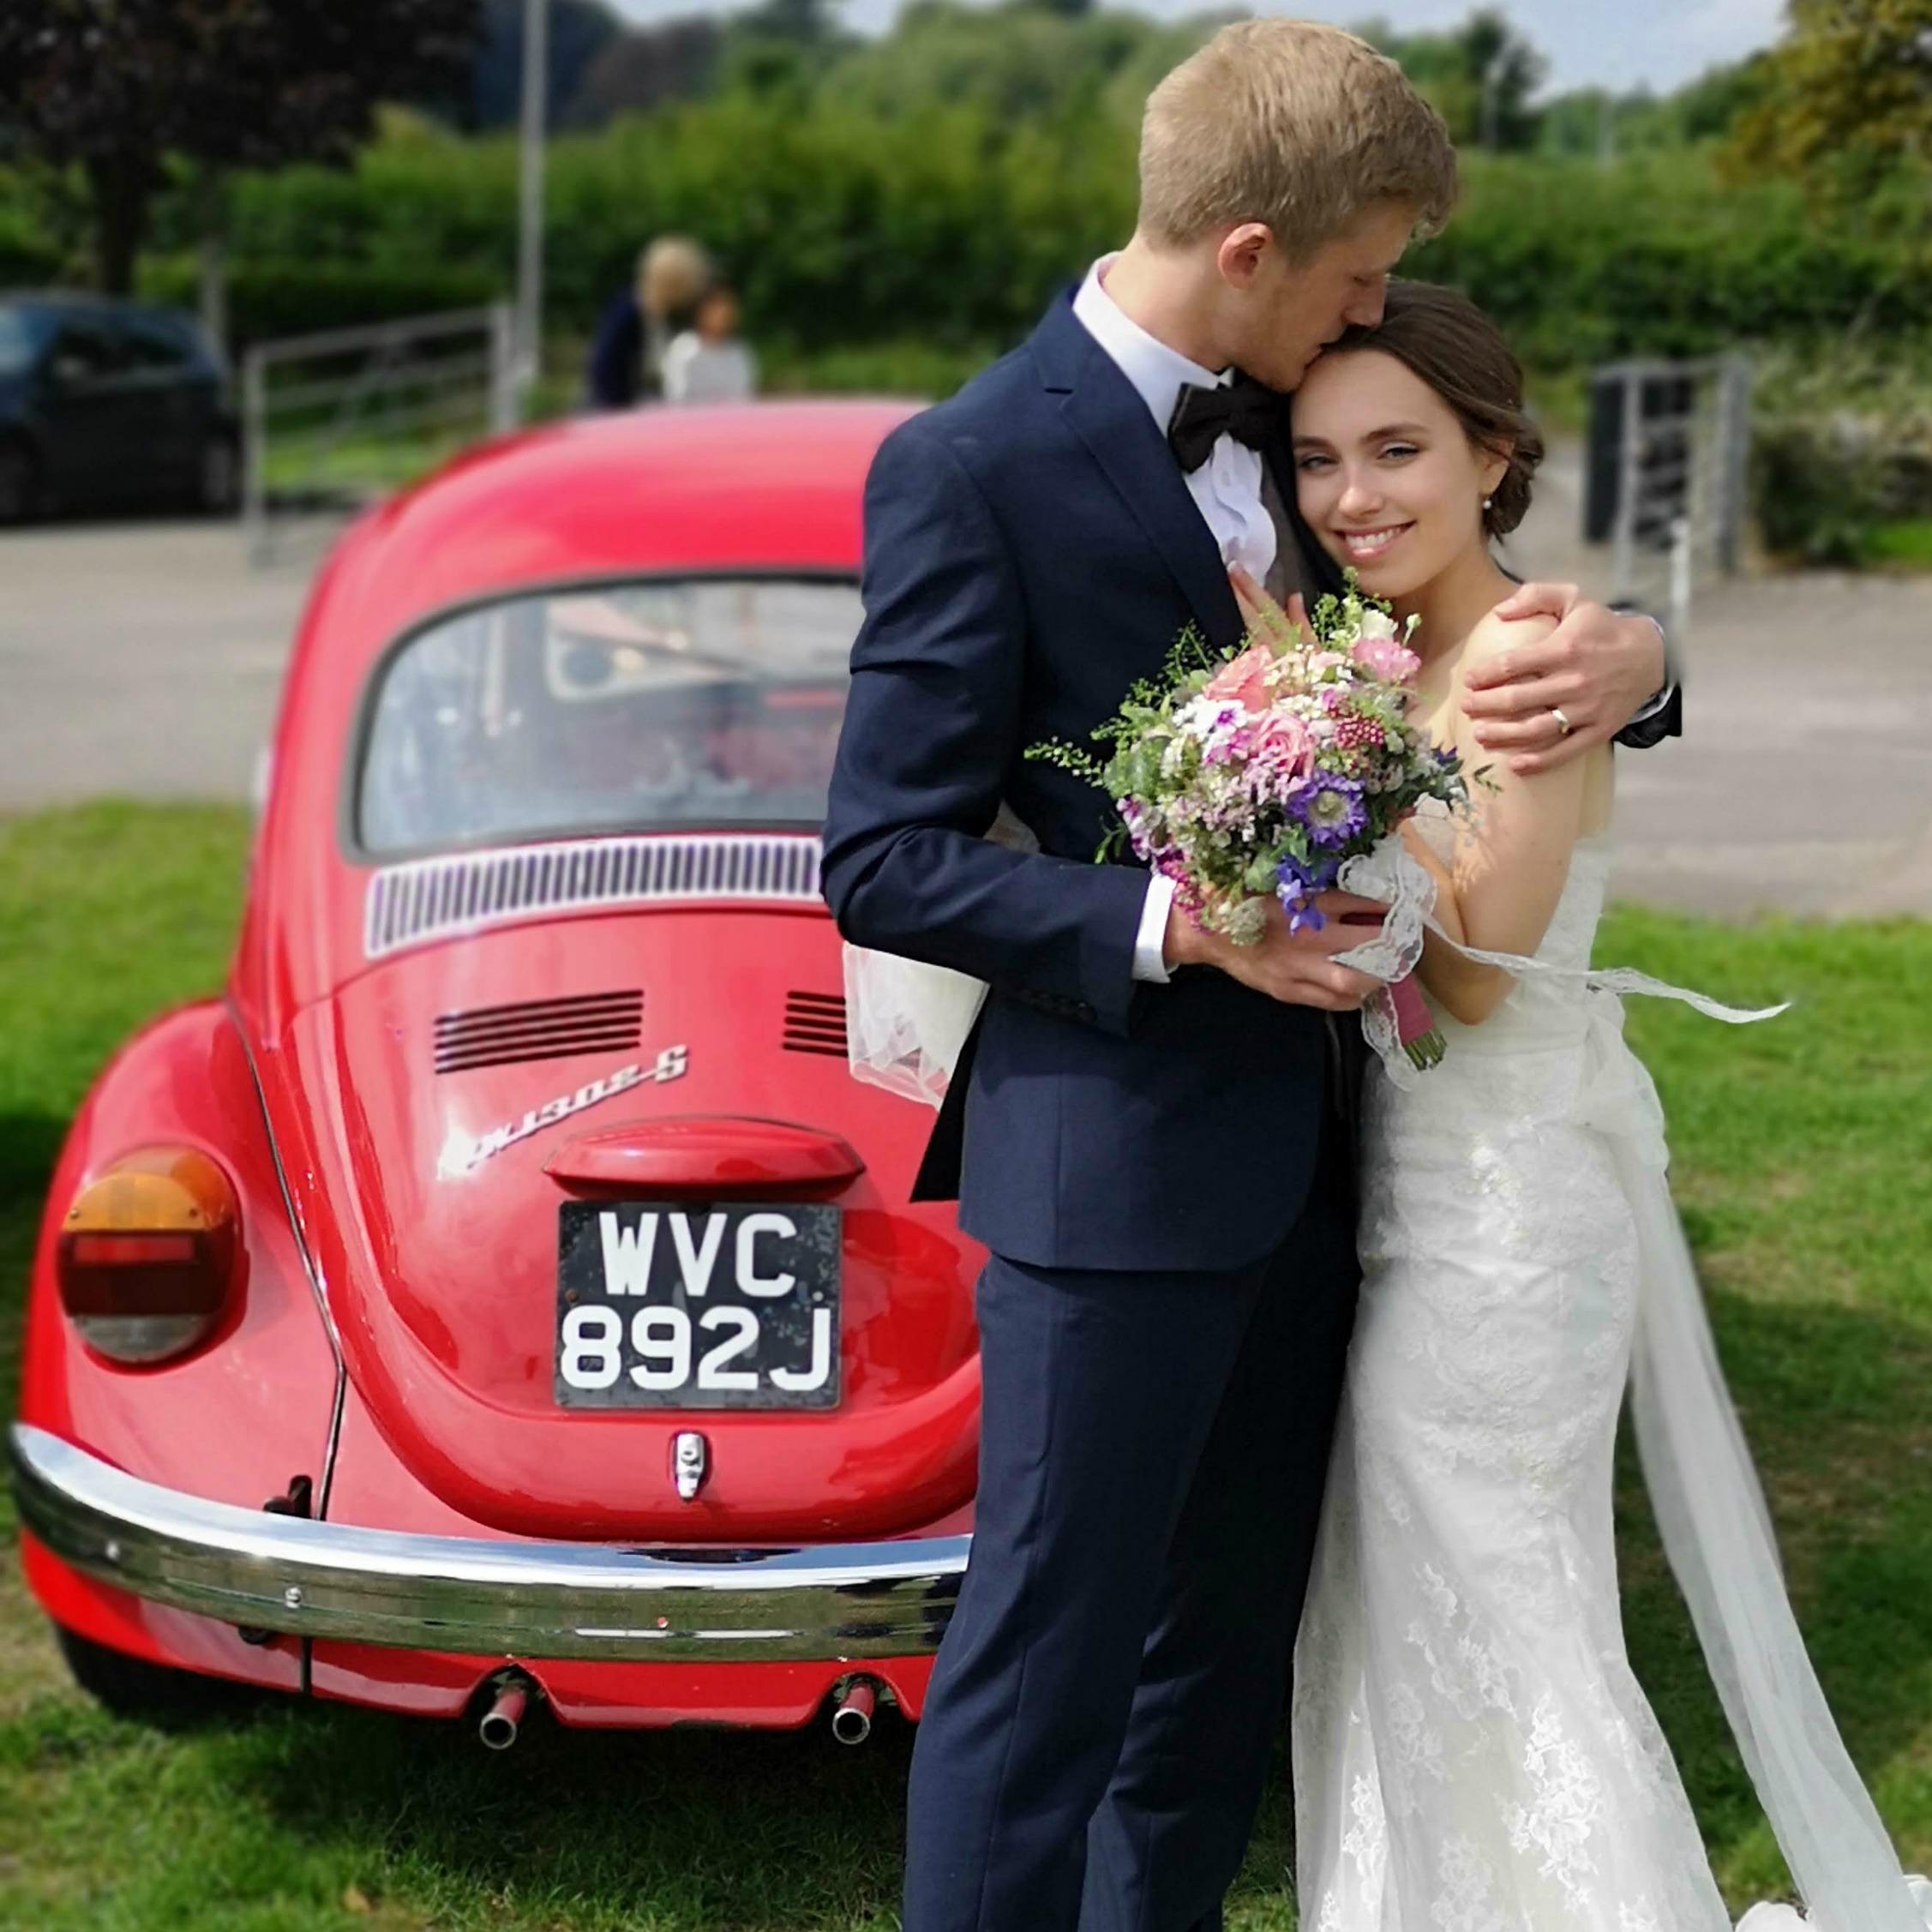 Supplier Spotlight Lovebug Wedding Cars Chew Valley Weddings